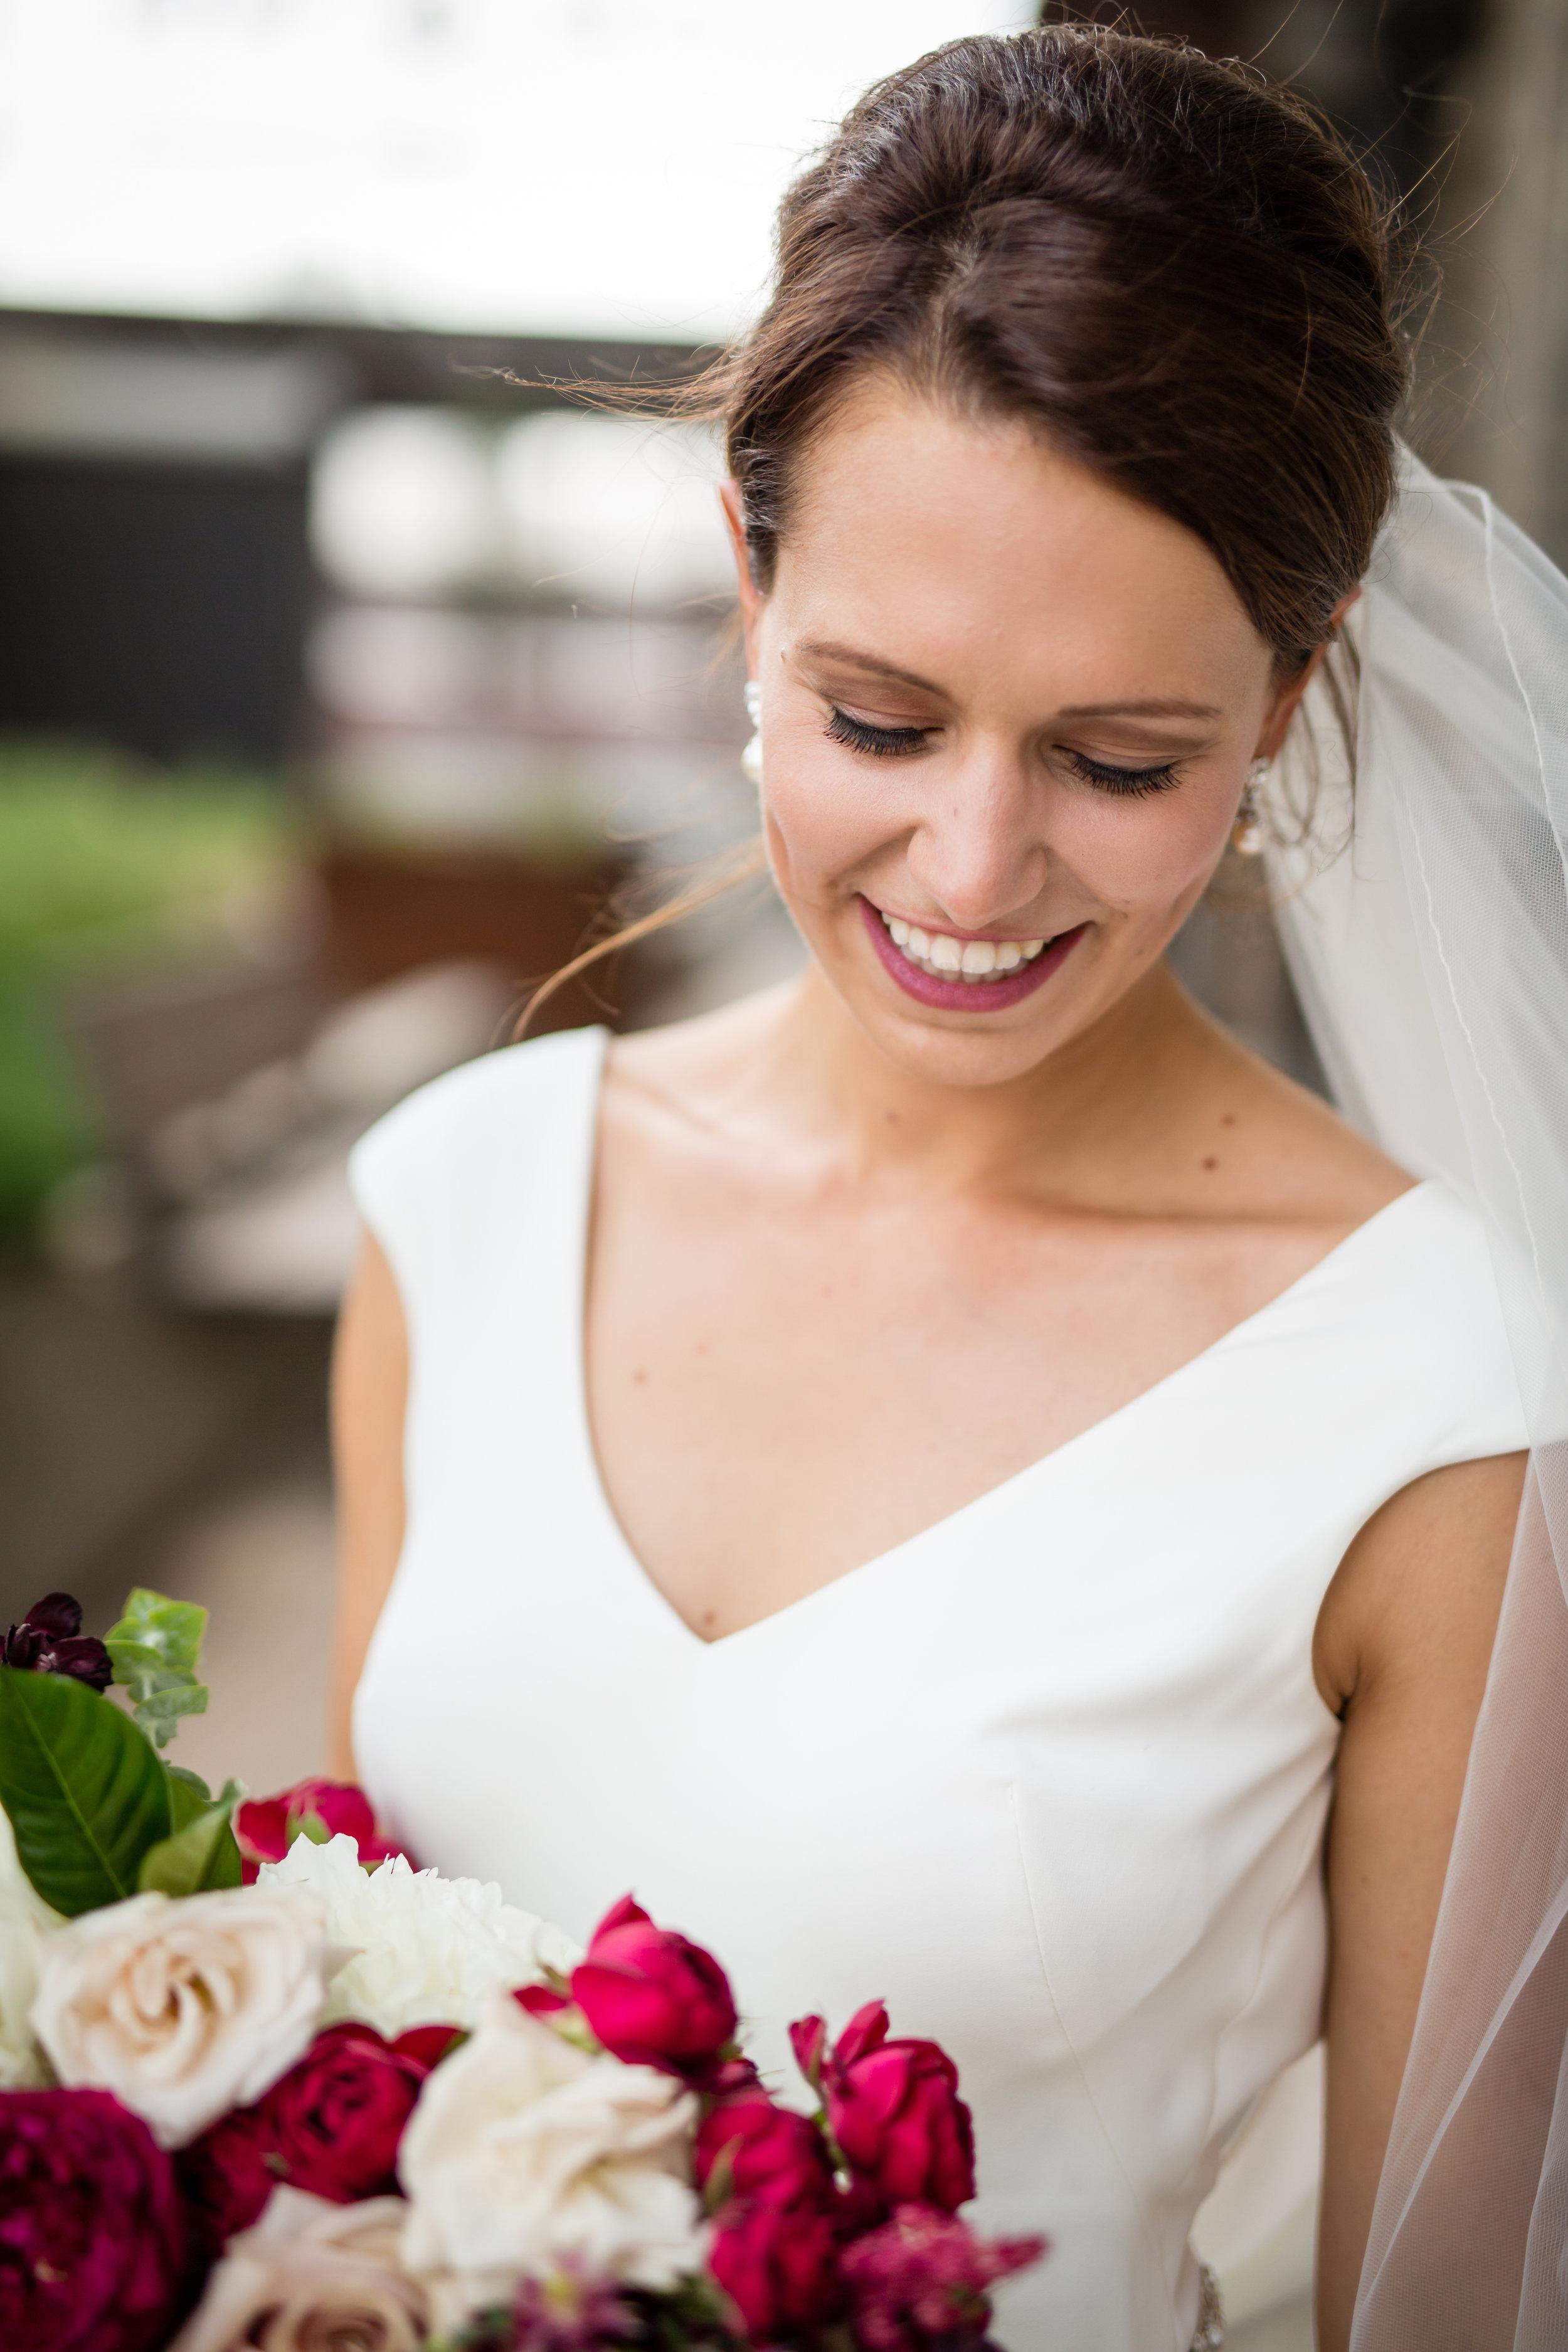 Aversa Wedding 6.10.17-245.JPG